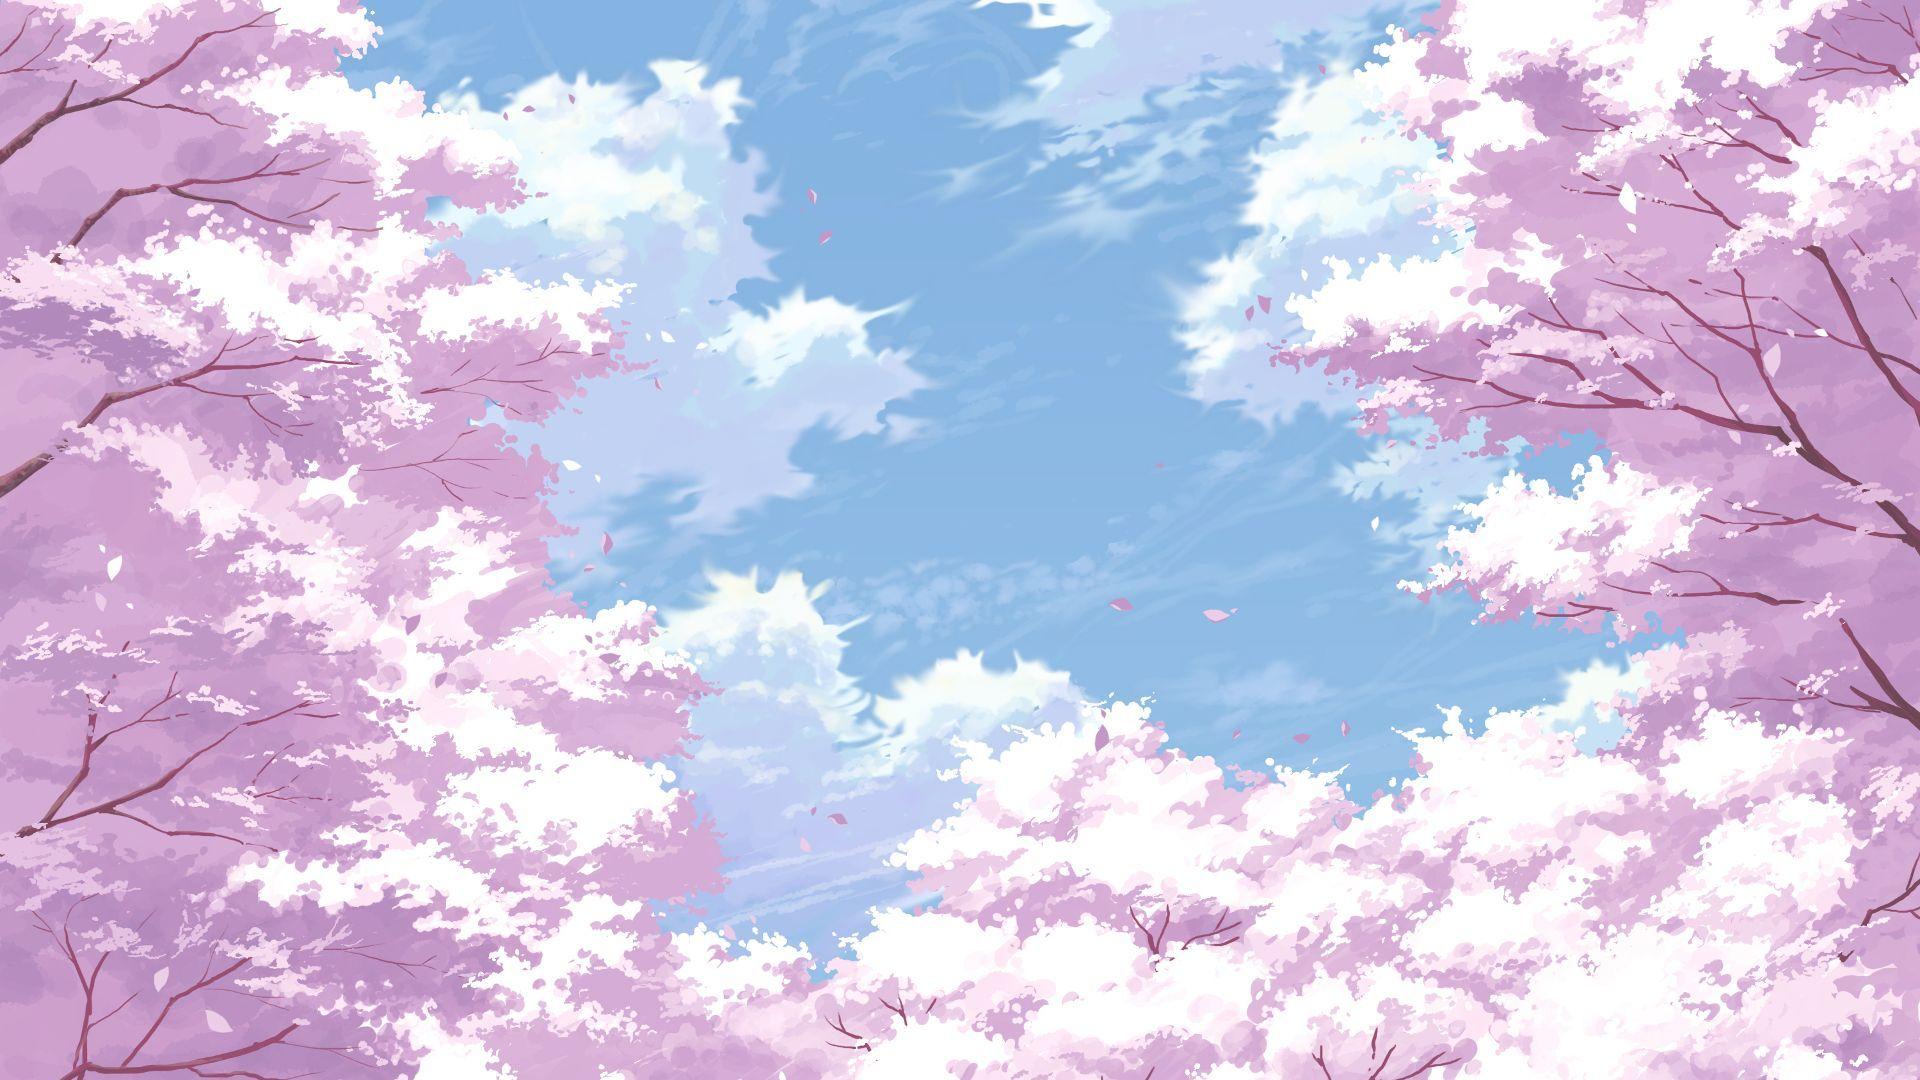 Anime Sakura Tree Wallpaper 1920x1080